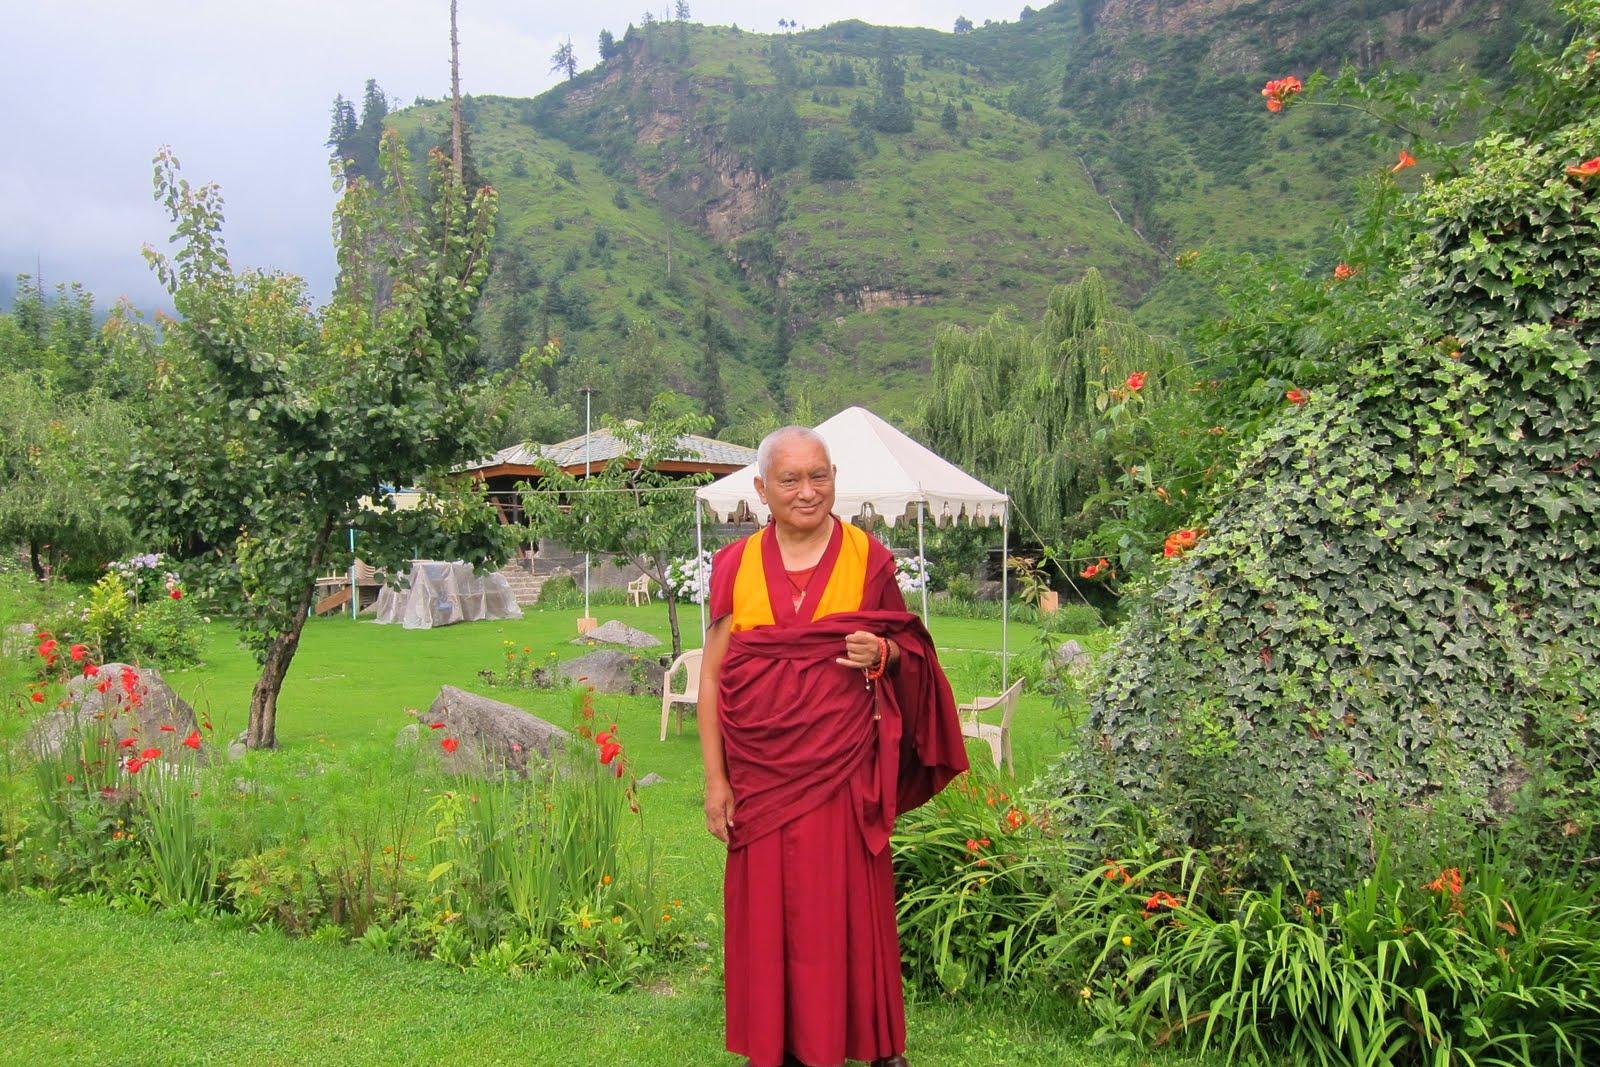 Rinpoche in Manali, India, enjoying the gardens. July, 2013. Photo Ven. Sarah Thresher